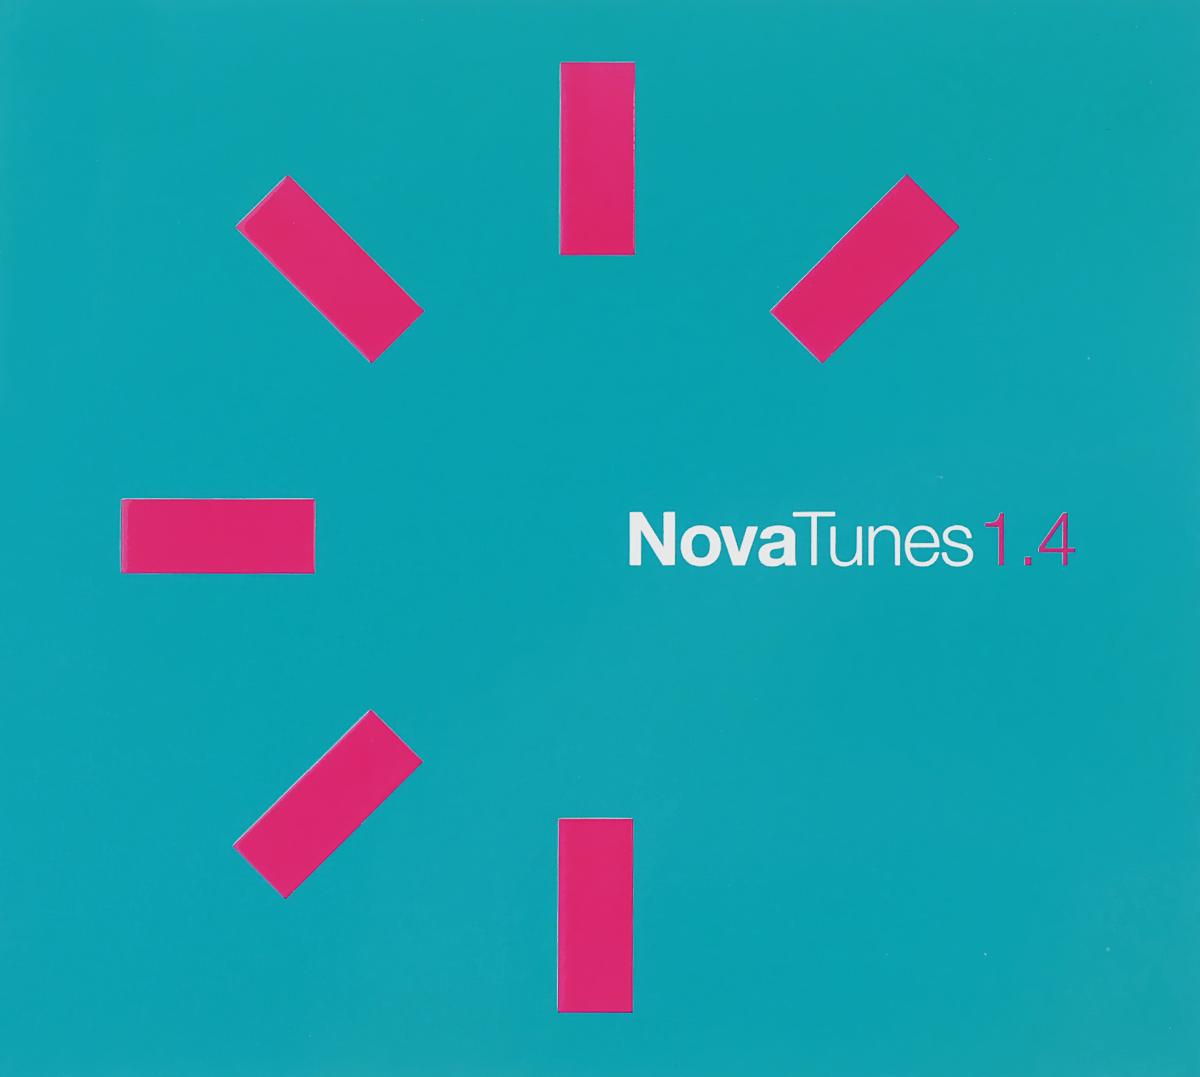 Nova Tunes 1.4